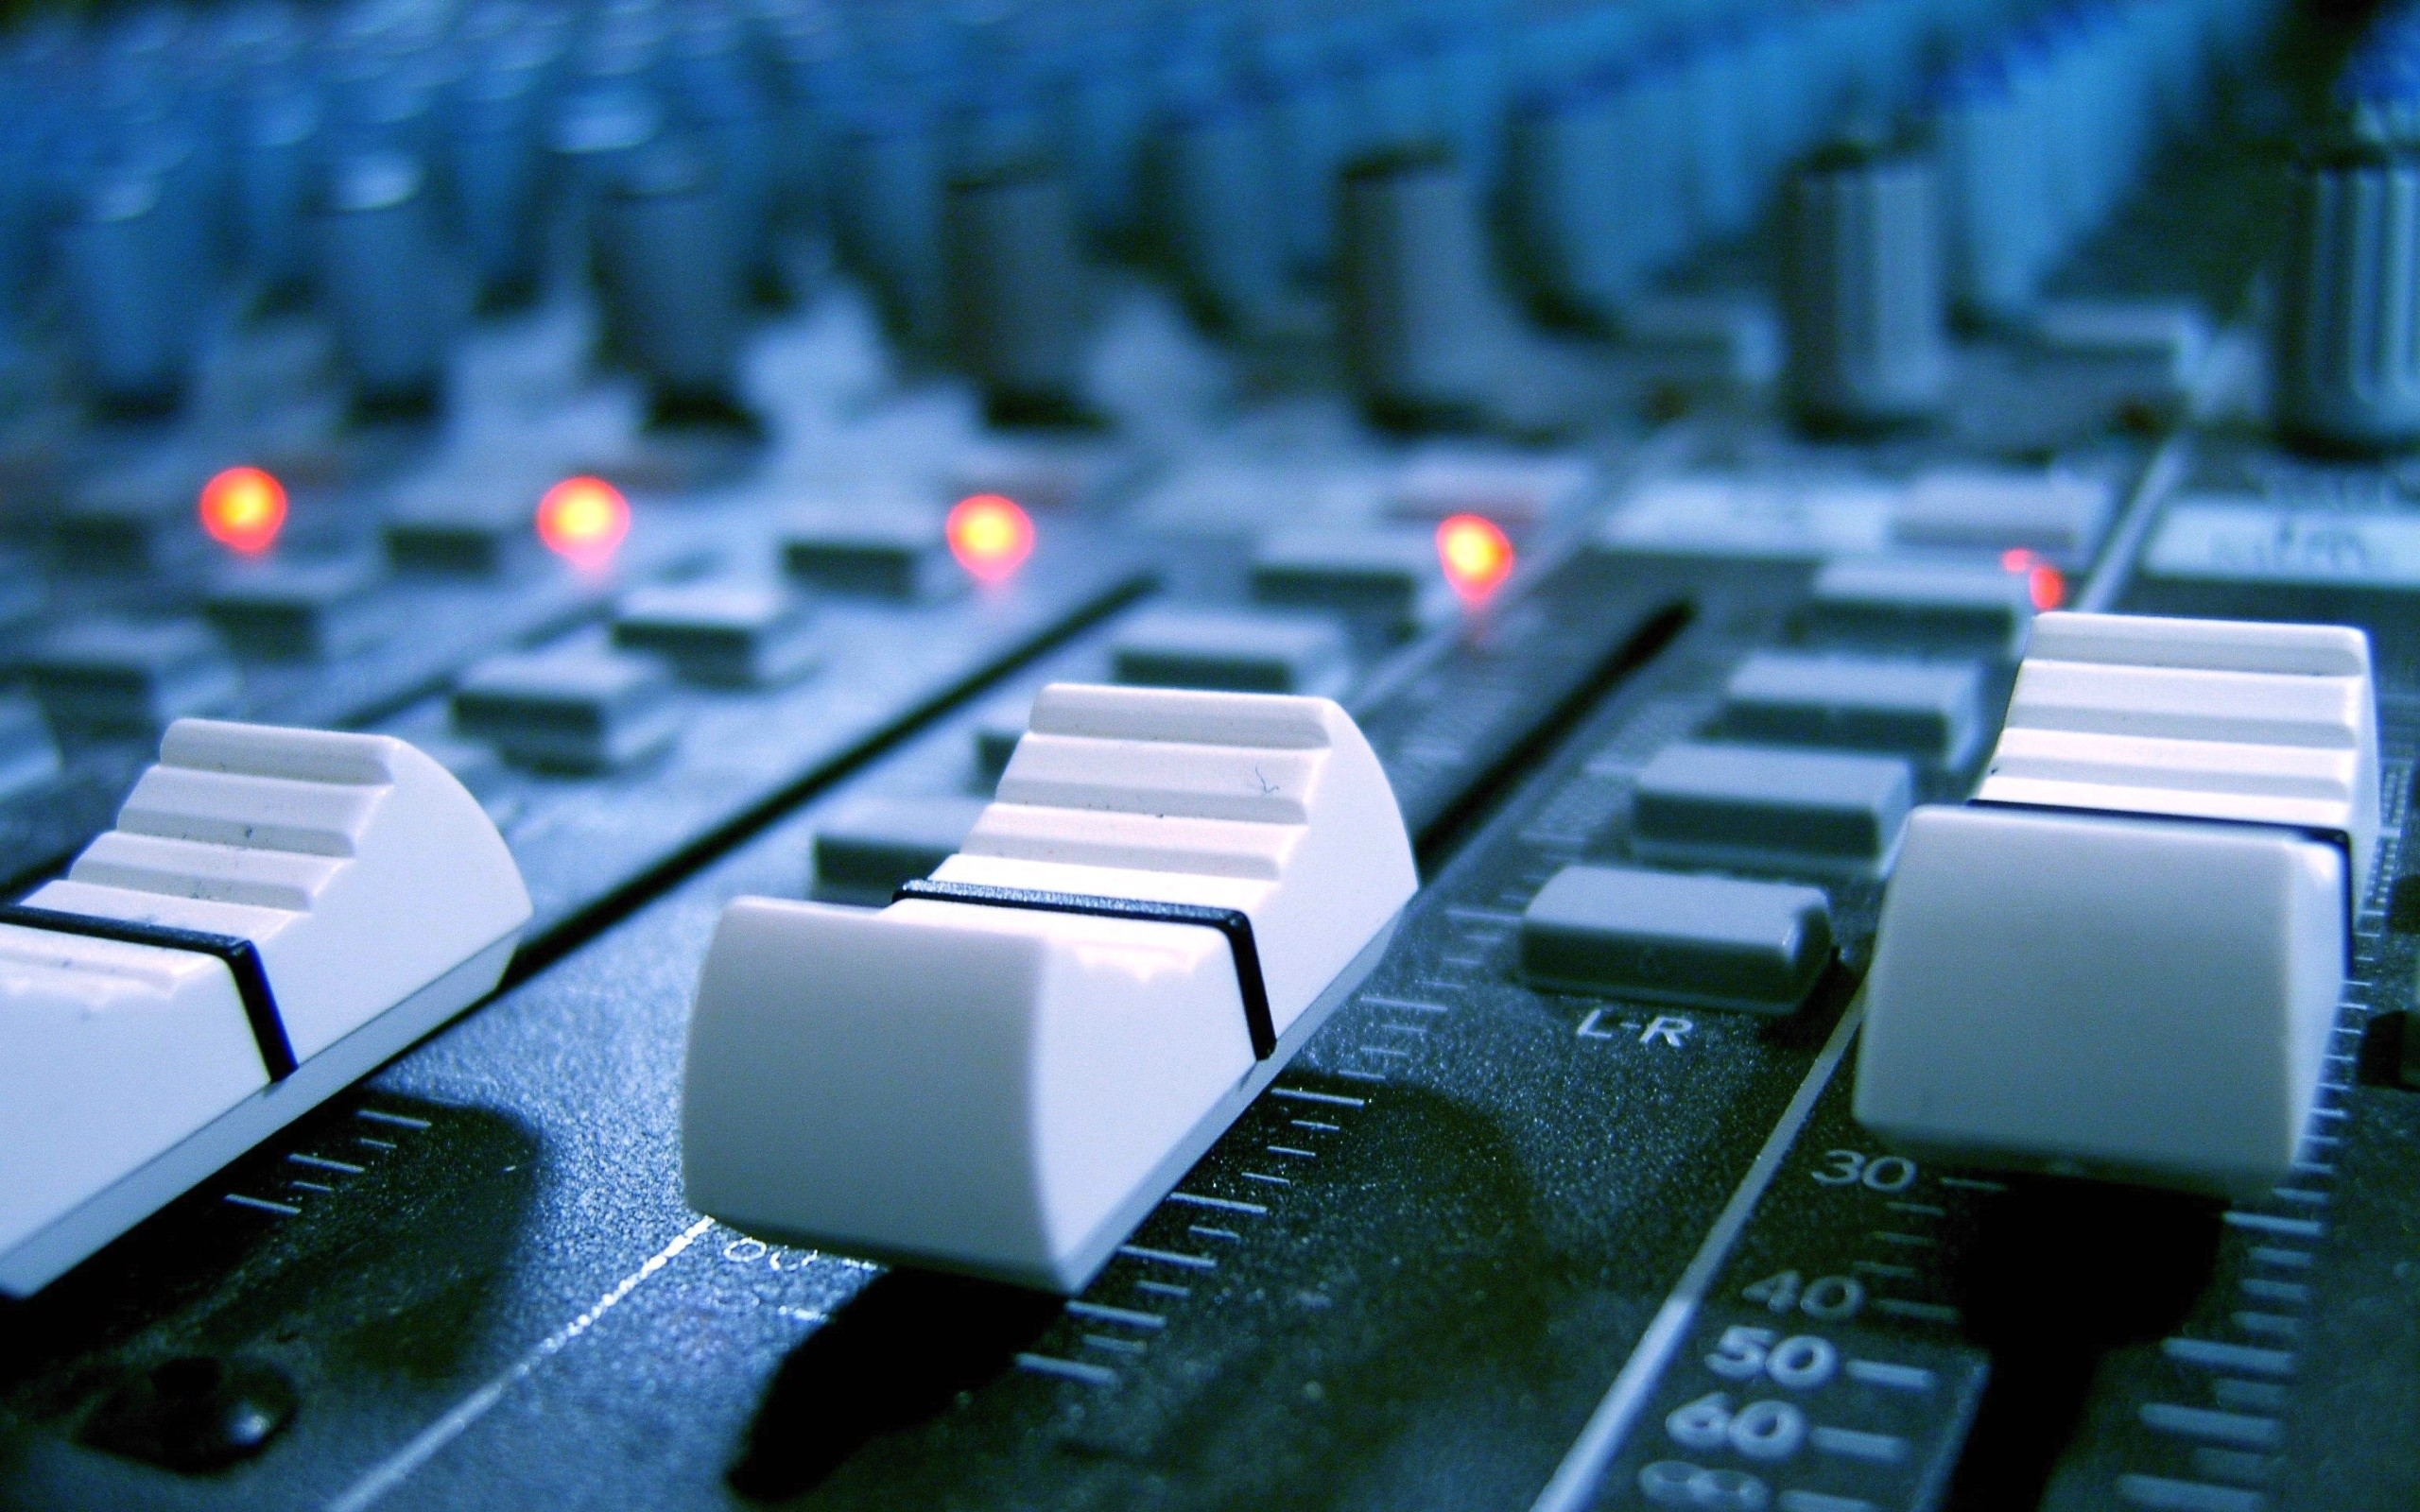 Music production wallpaper 66 images - Music recording studio wallpaper ...